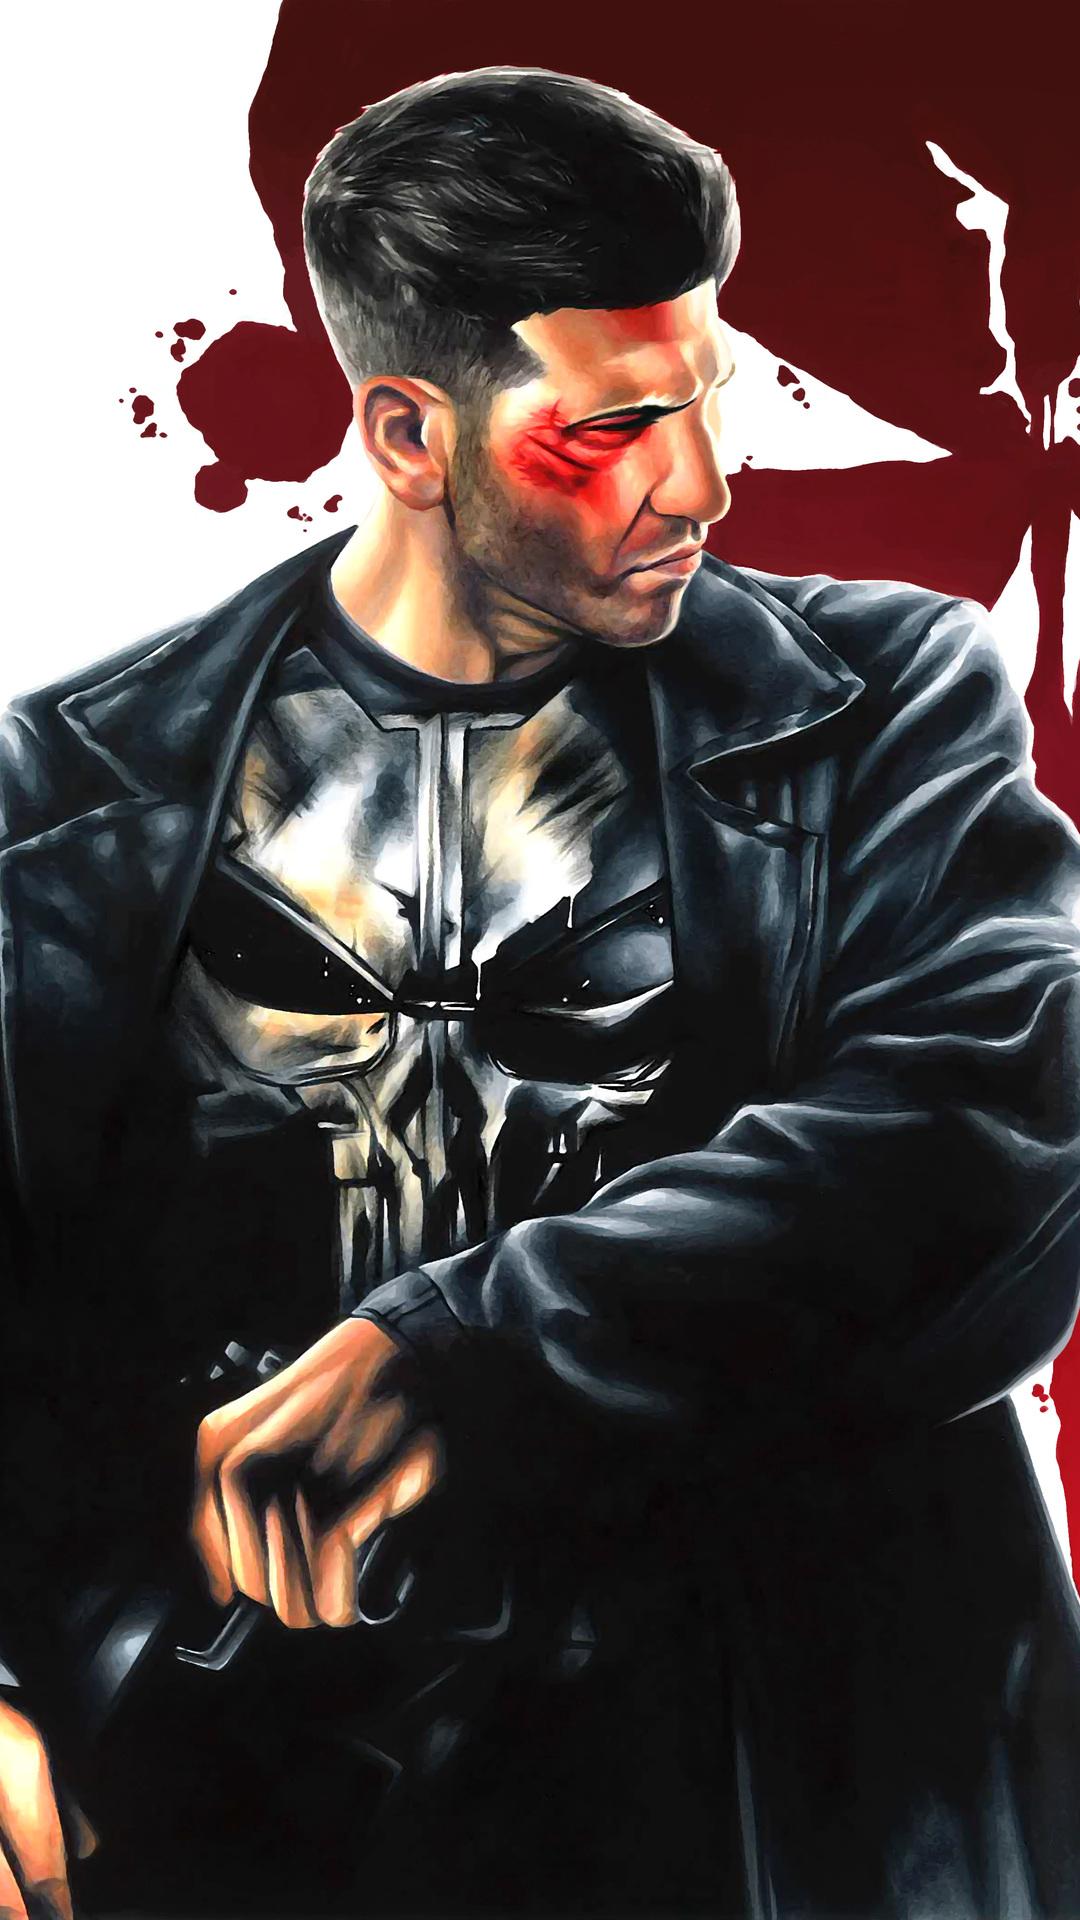 1080x1920 The Punisher Fanart Iphone 7,6s,6 Plus, Pixel xl ...